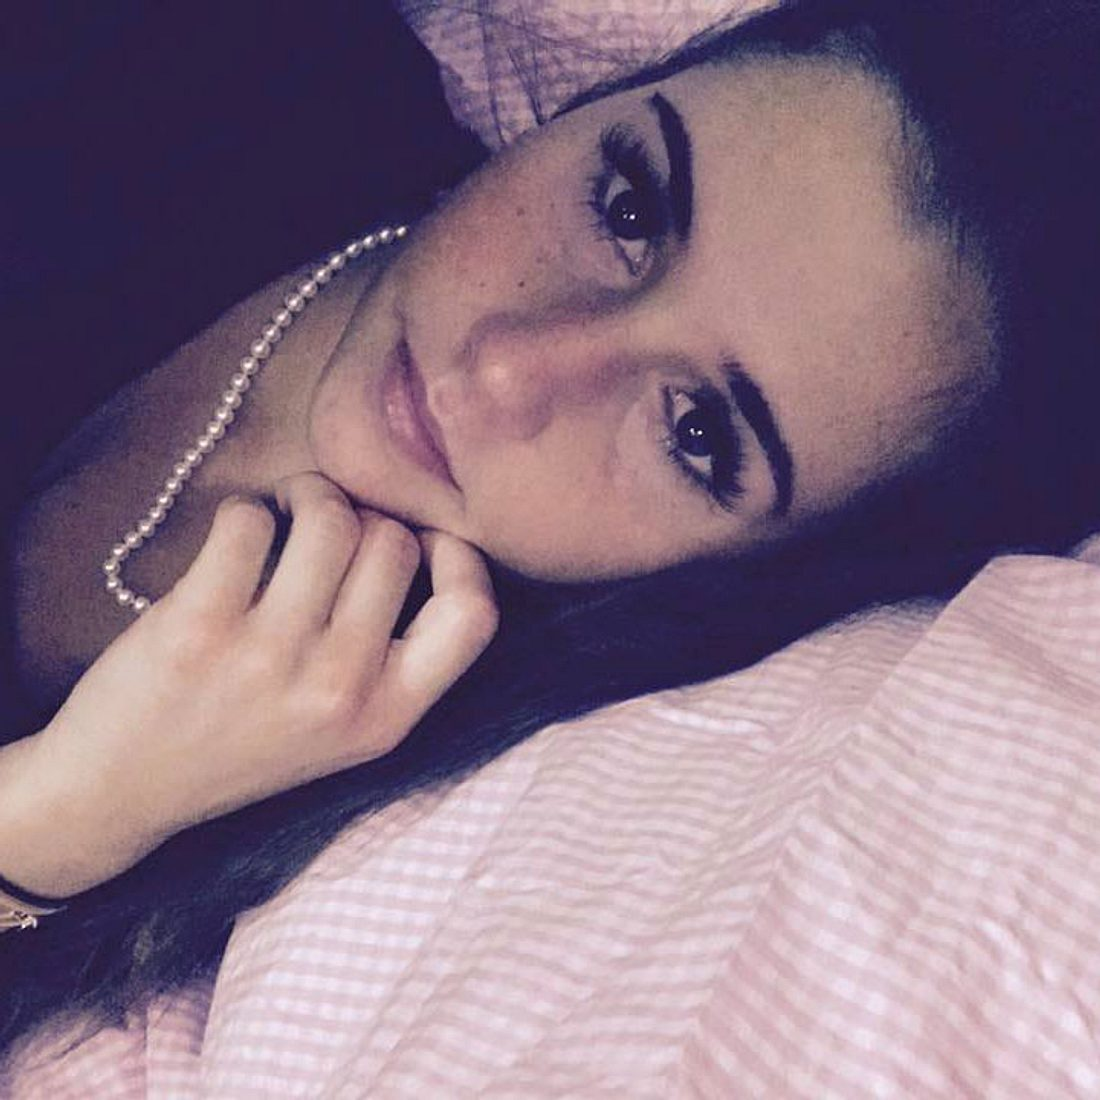 Sarah Lombardi: Trennung von Michal T.?